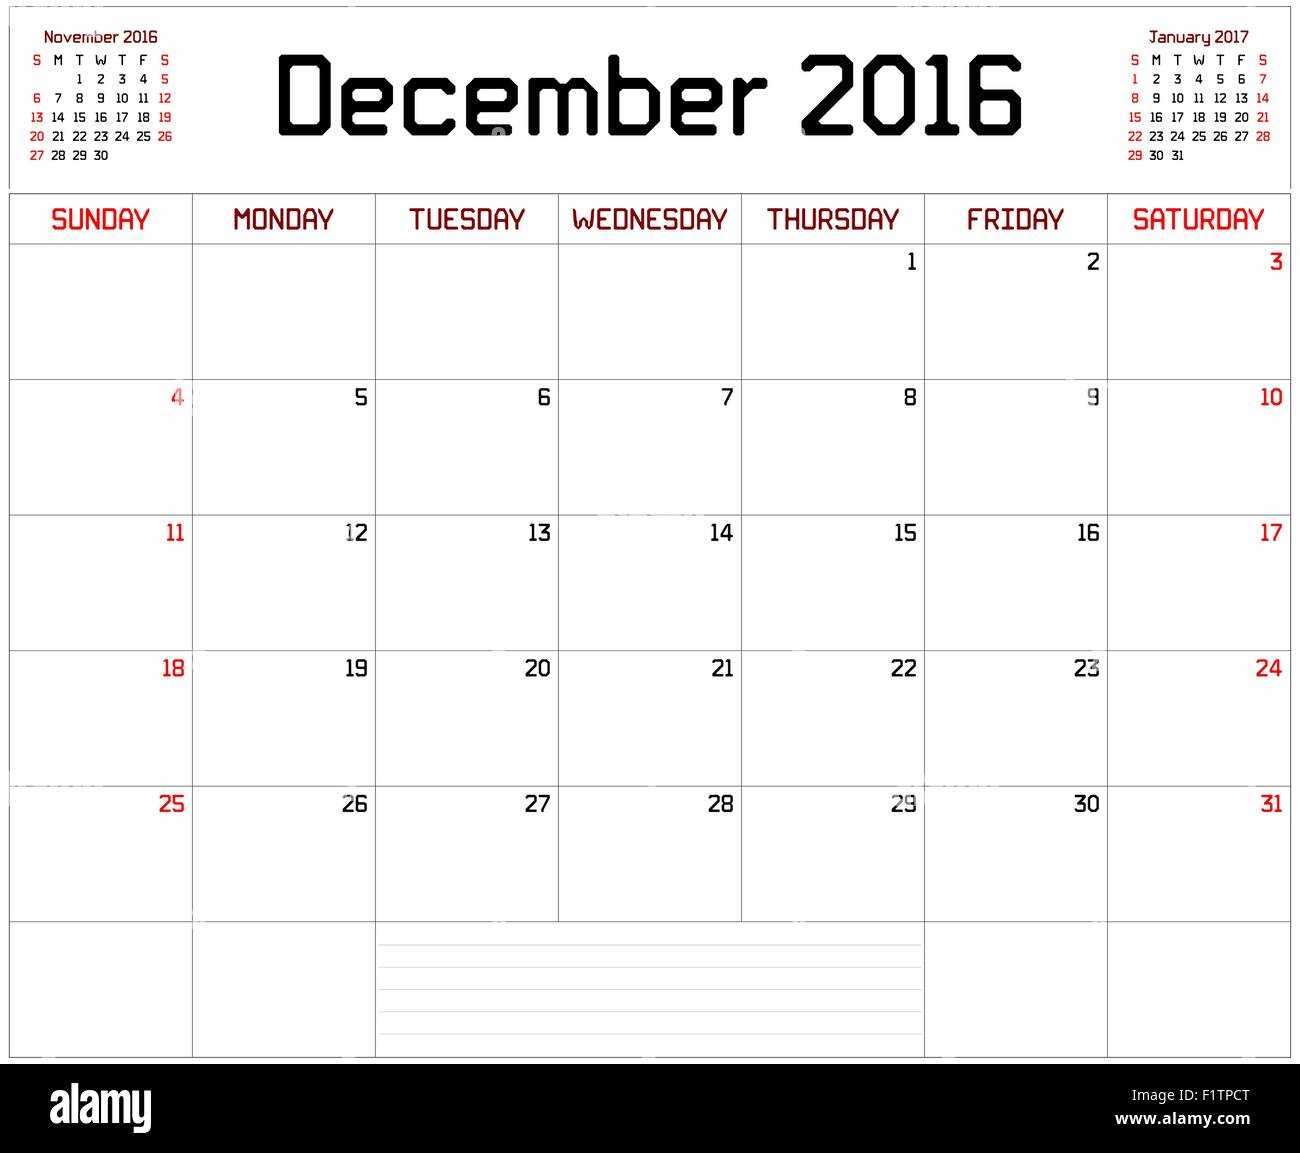 a monthly planner calendar for december 2016 on white a custom